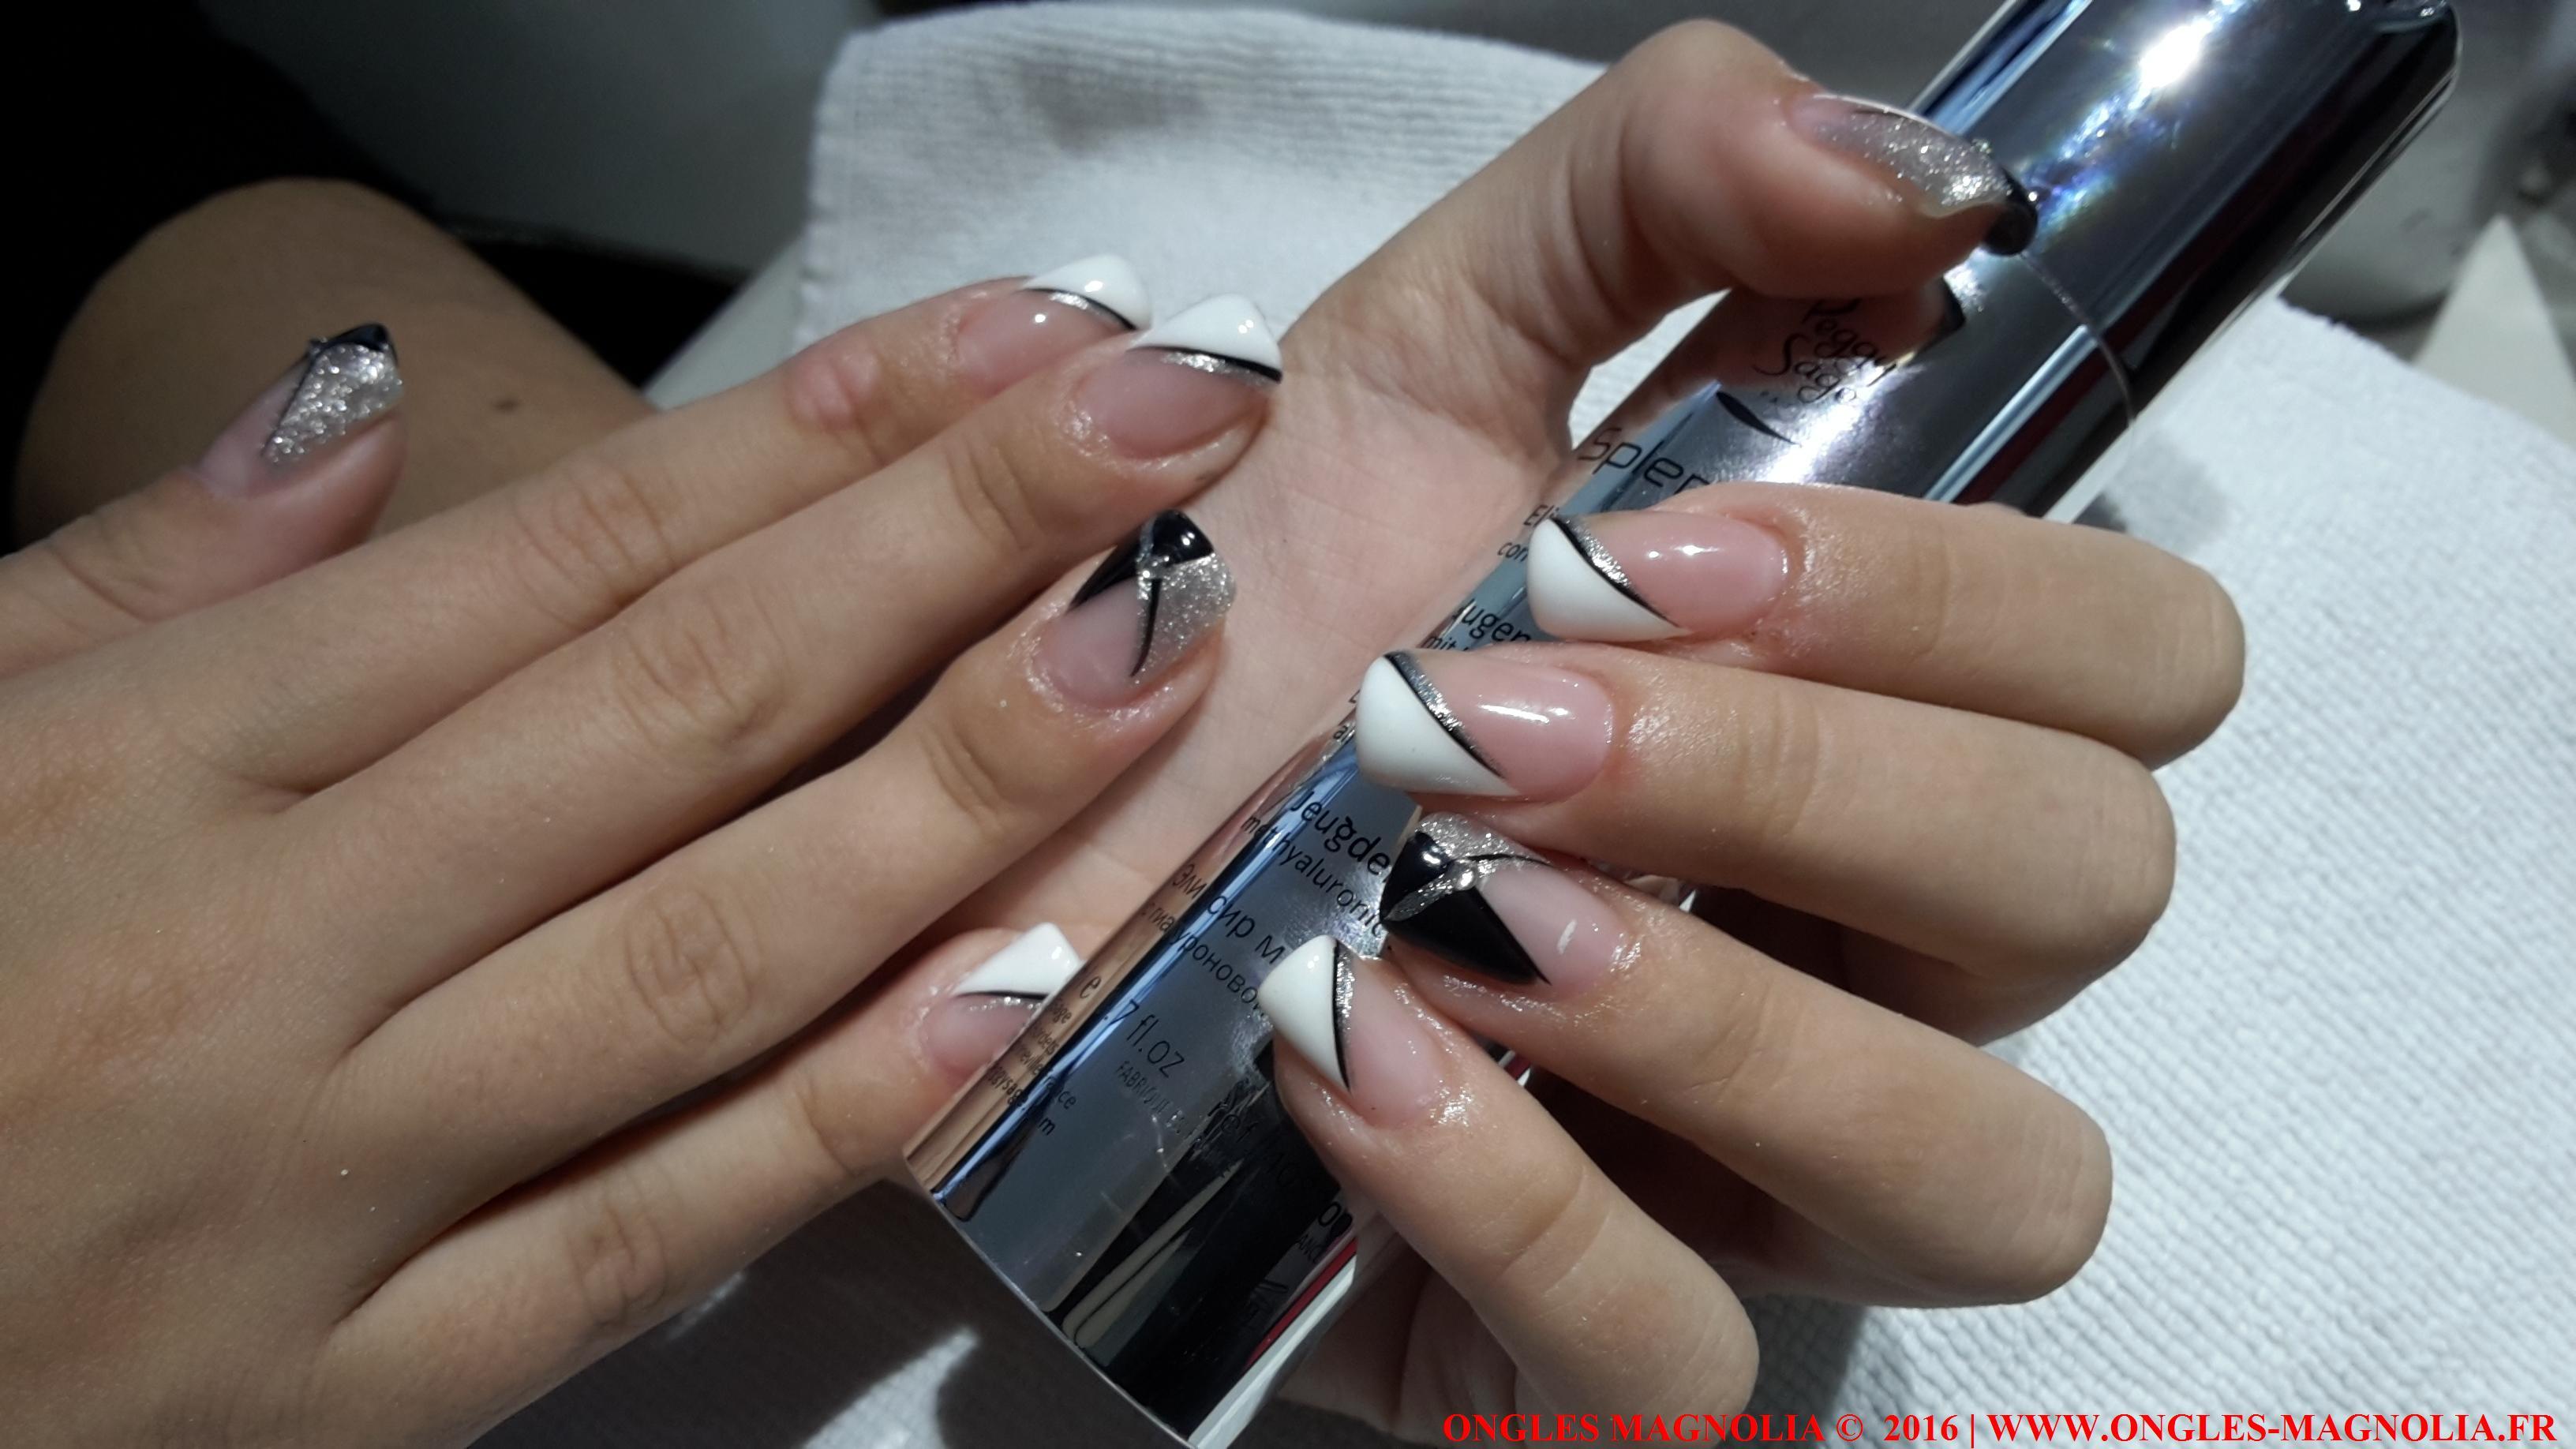 Pose-ongles-nail-art-neuville-sur-saone-lyon-ongles magnolia 112016